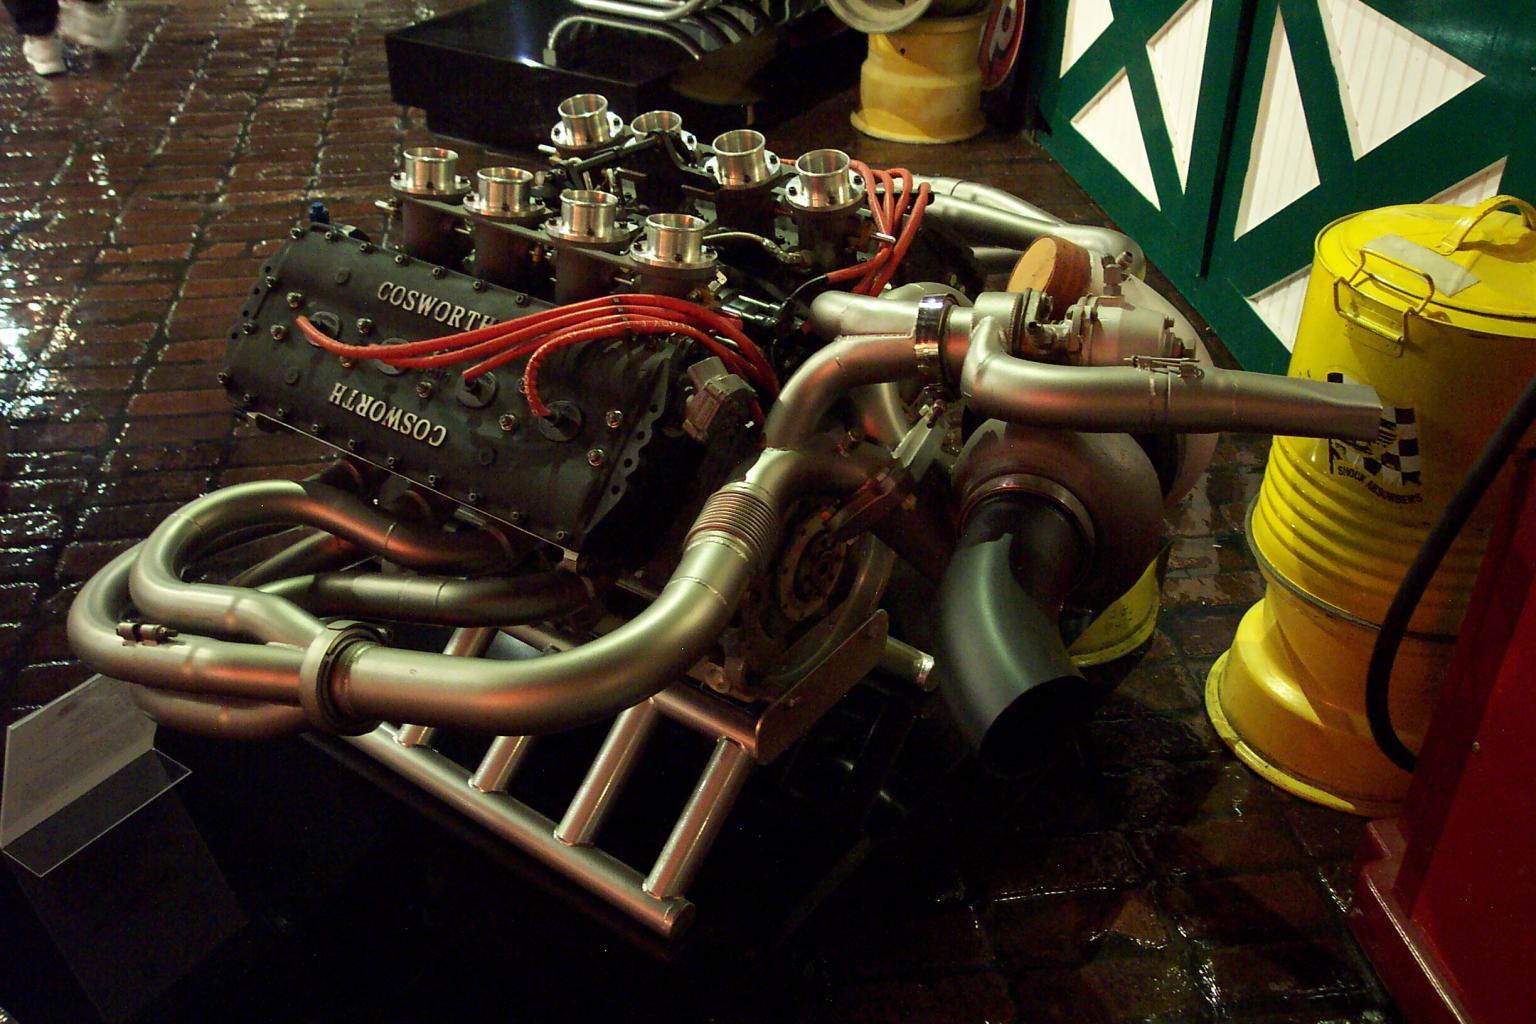 Cosworth_DFX_engine.jpg